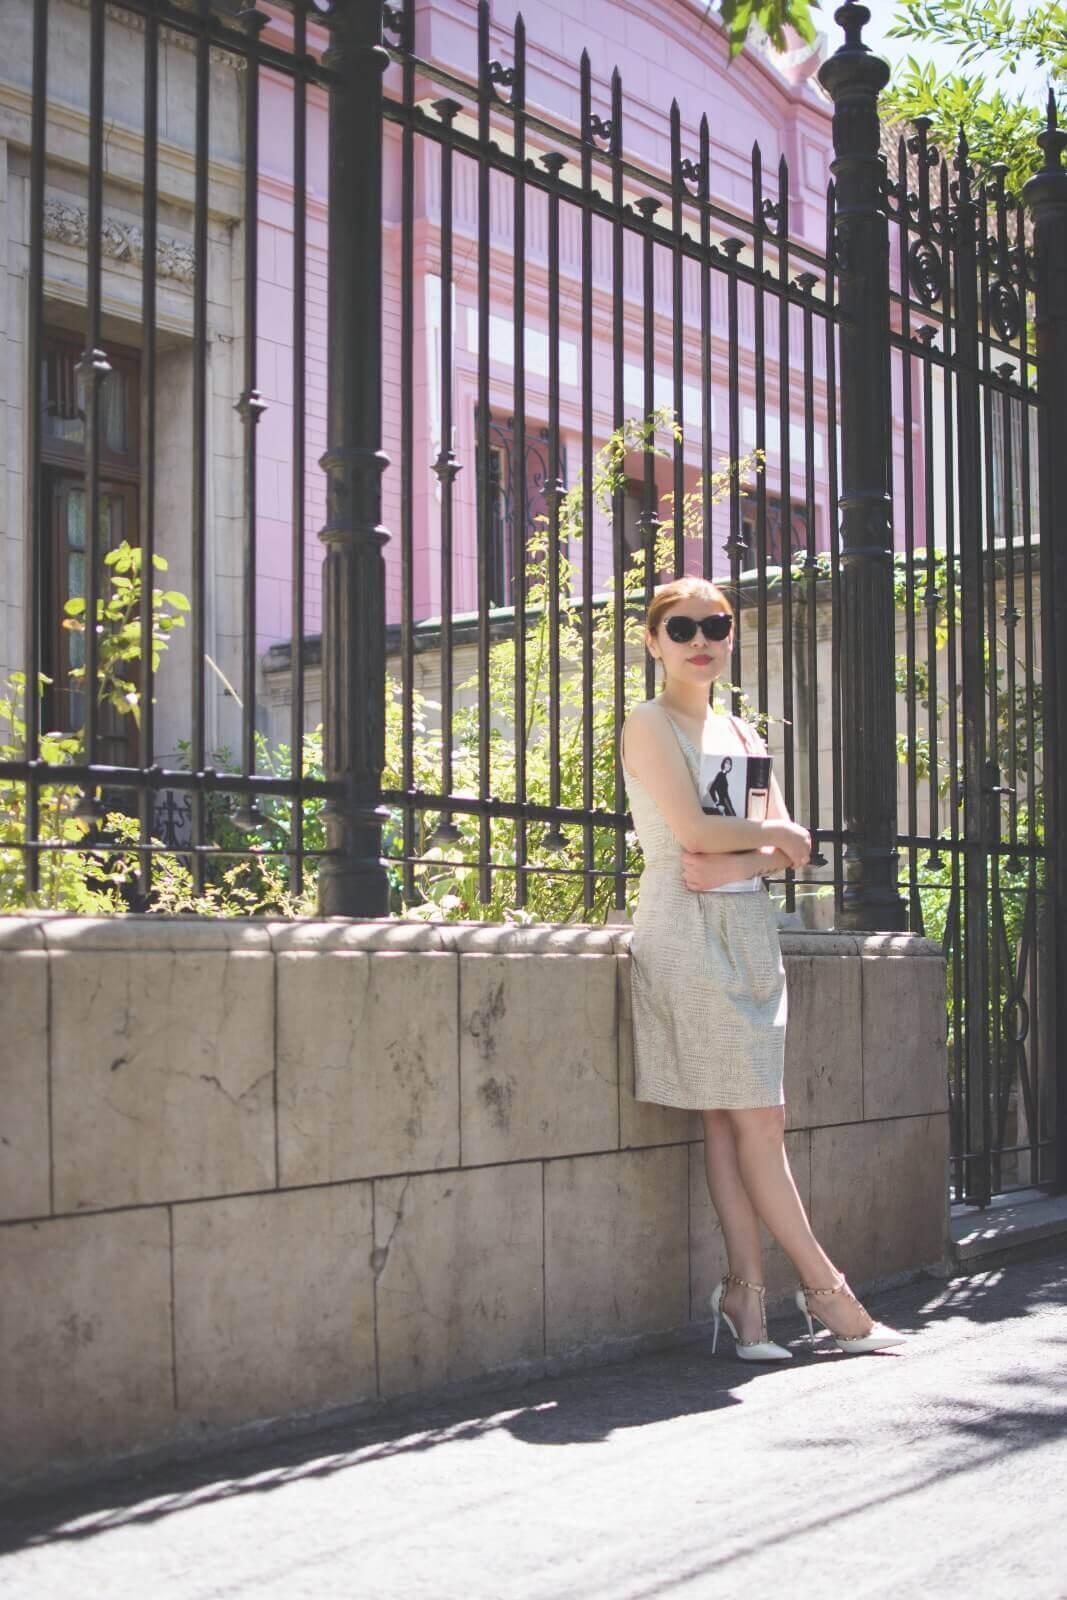 almond-white-dress-sammydress-stilettos-valentino-rockstud-imitation-deborah-ferrero-style-by-deb-ladylike02